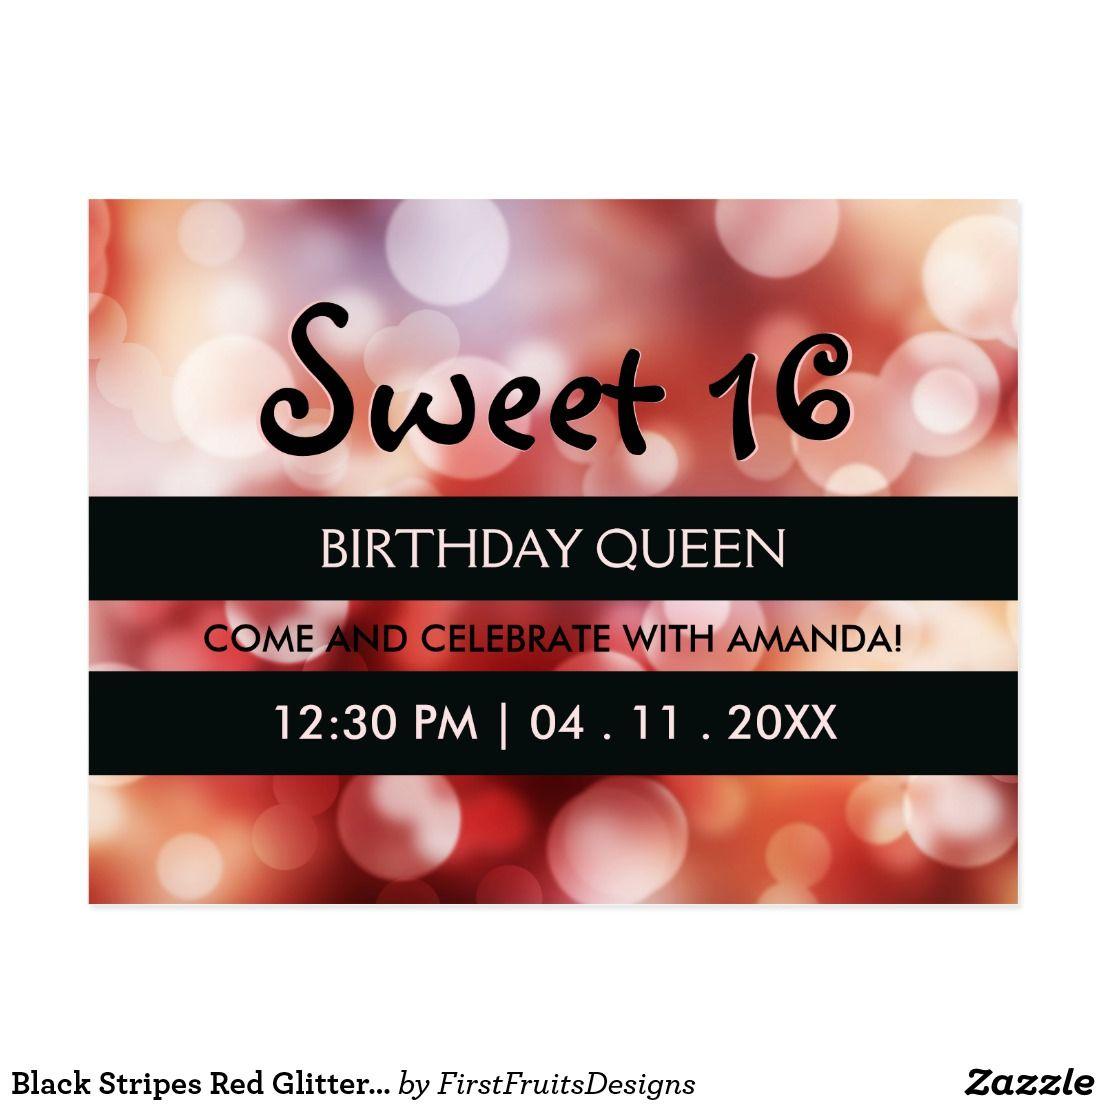 Black Stripes Red Glitter Sweet 16 Birthday Party Invitation ...